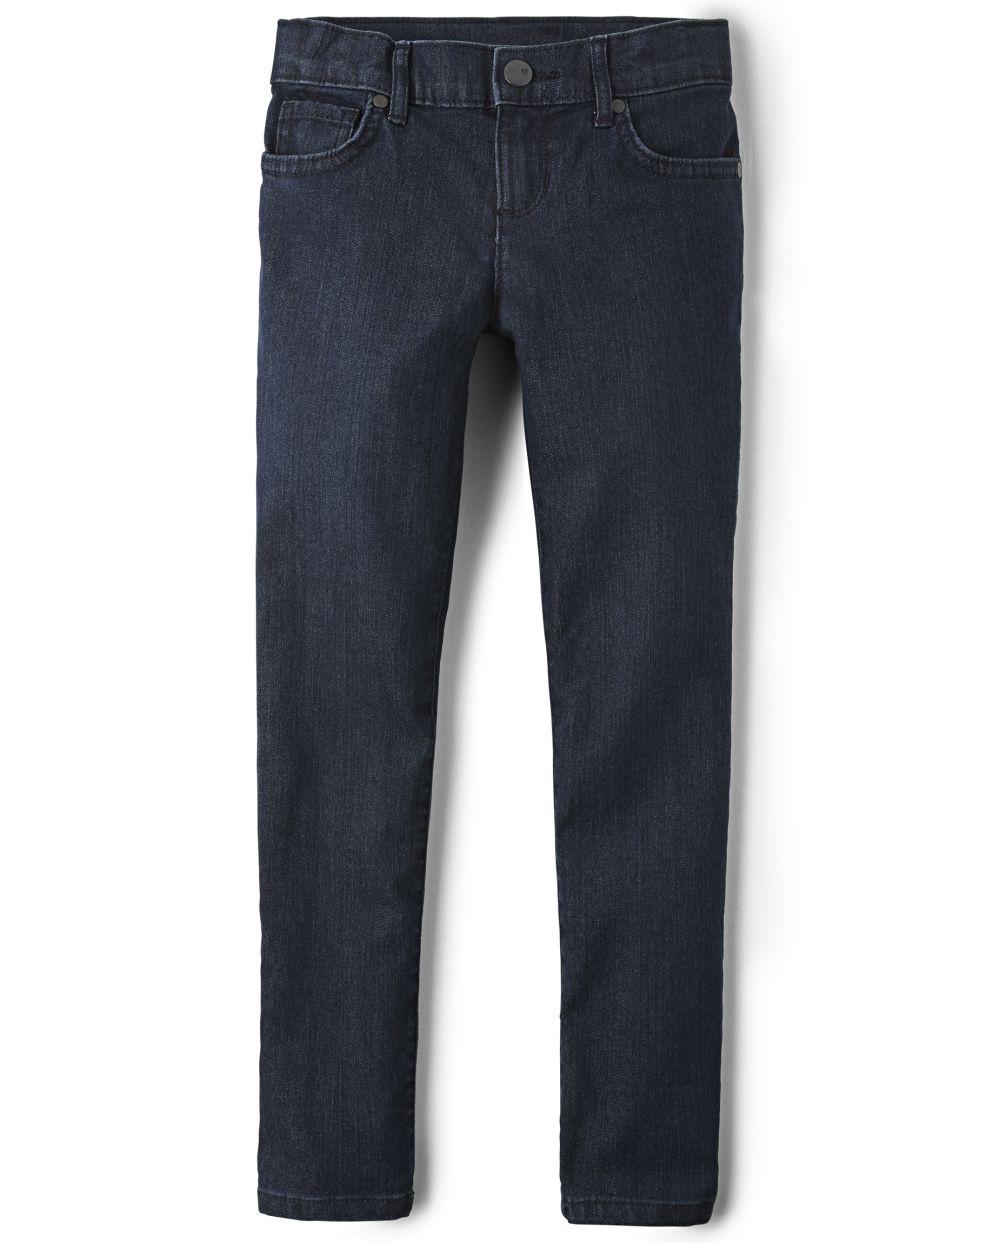 Promos Girls Basic Super Skinny Jeans